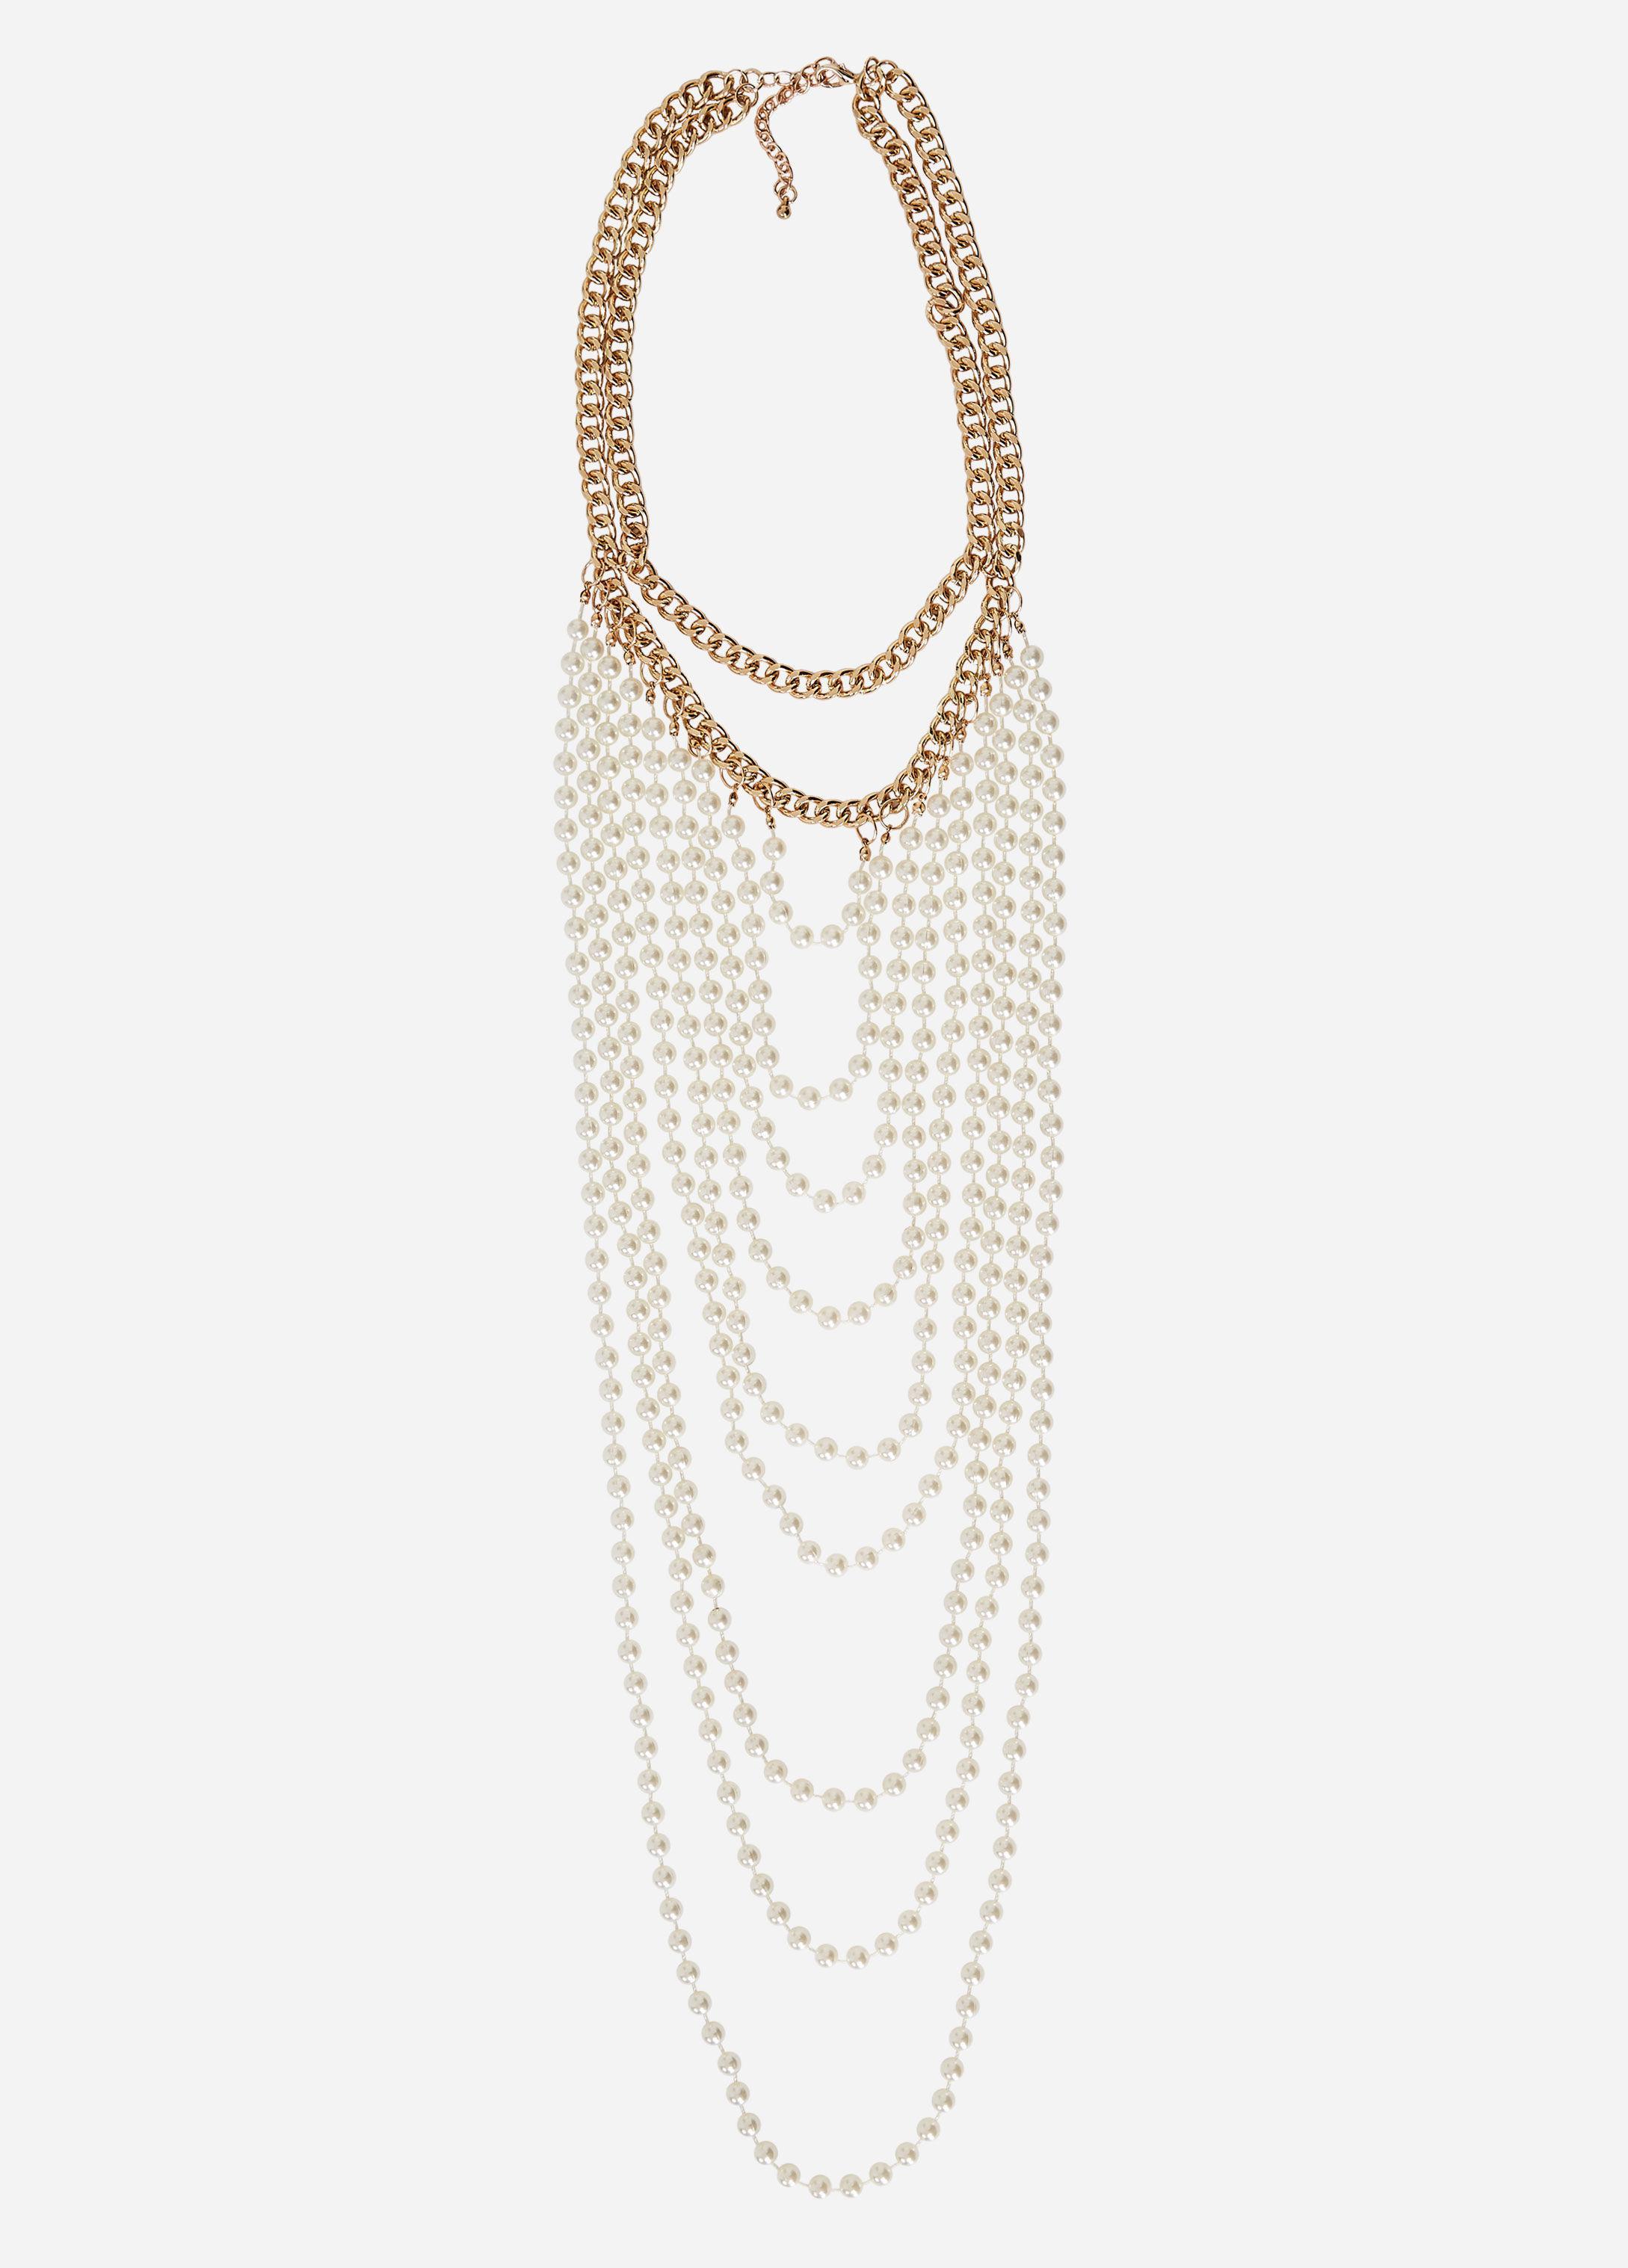 Ashley Stewart Druzy Beaded Gold Chain Necklace YMG1EAn